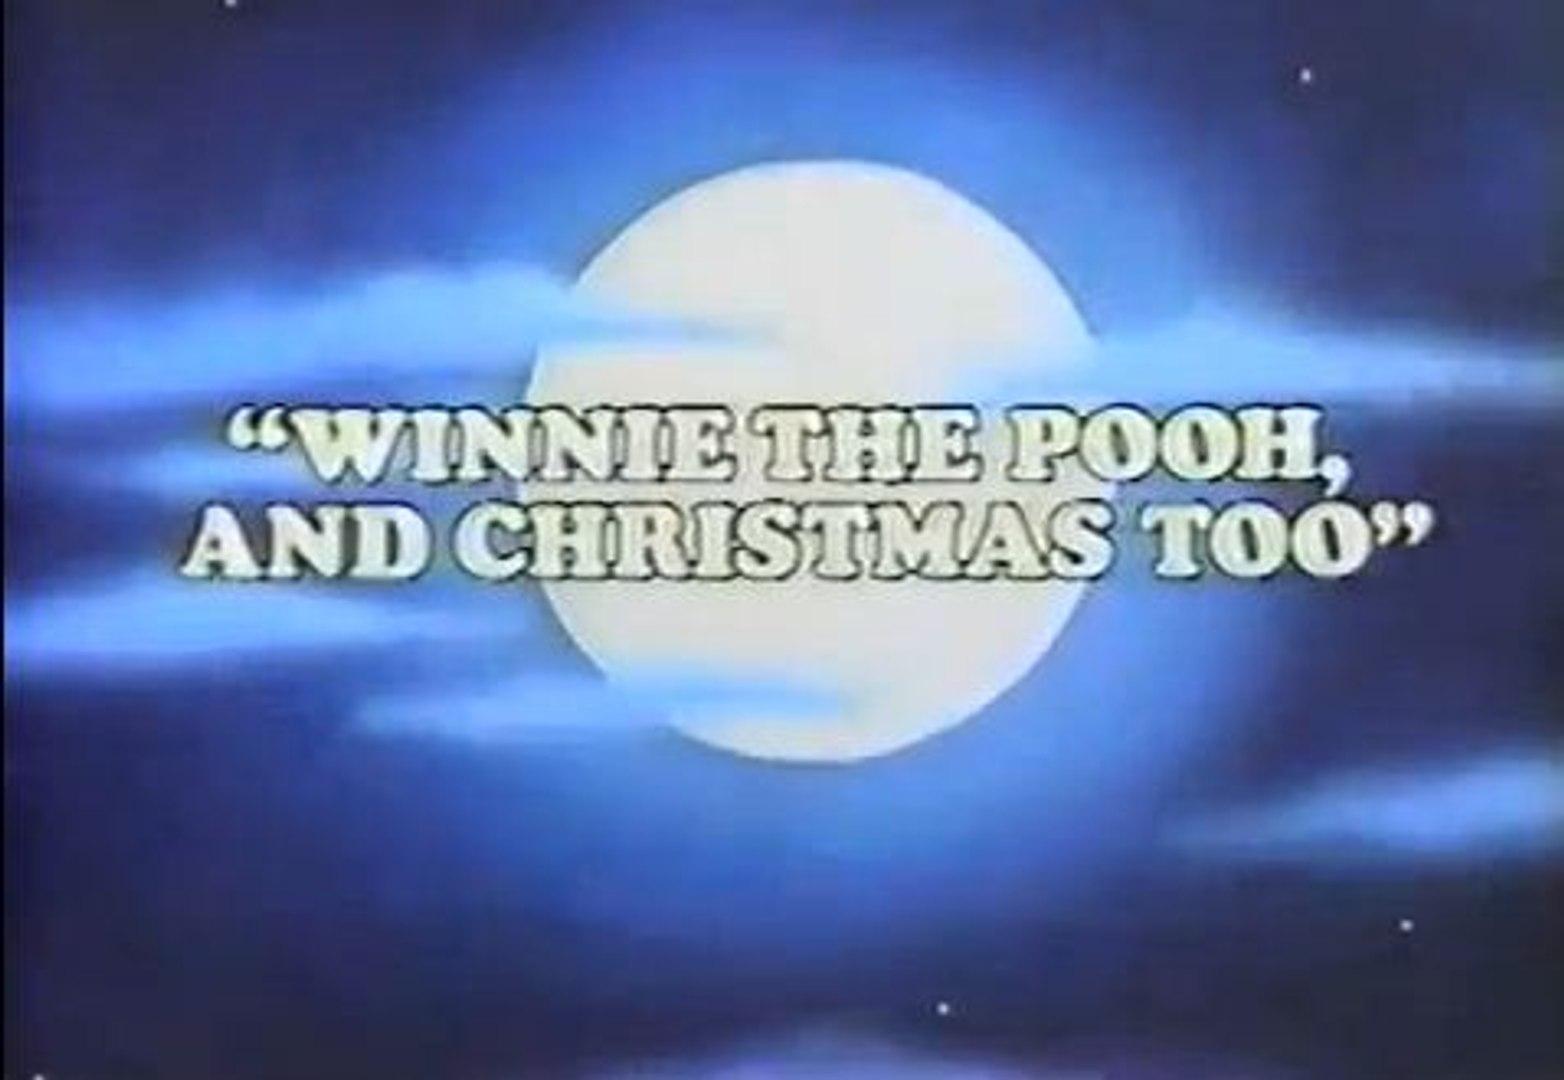 Winnie The Pooh And Christmas Too.Winnie The Pooh And Christmas Too 1991